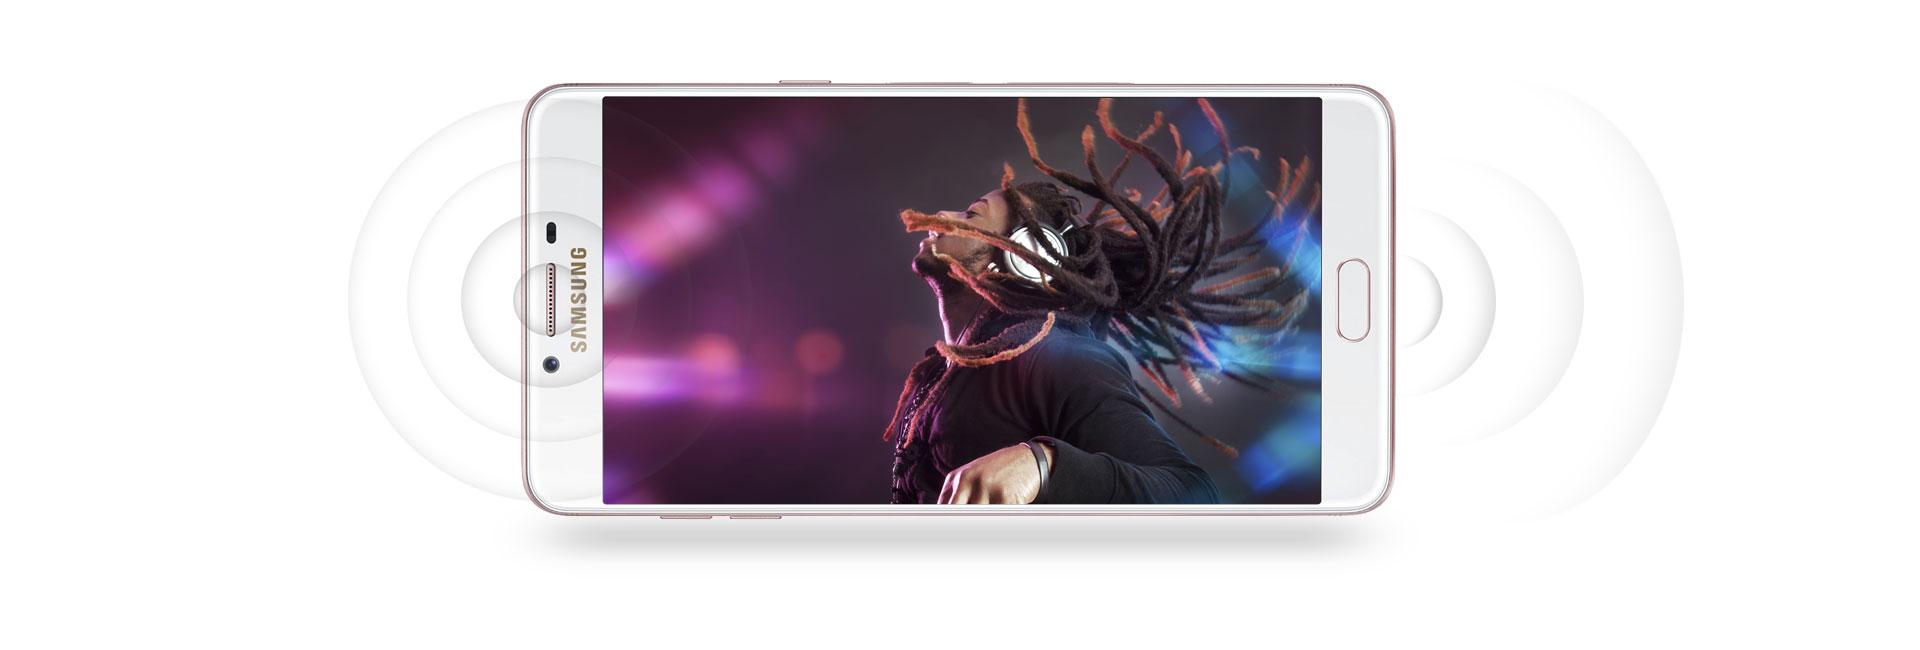 Samsung Galaxy C9 Pro China